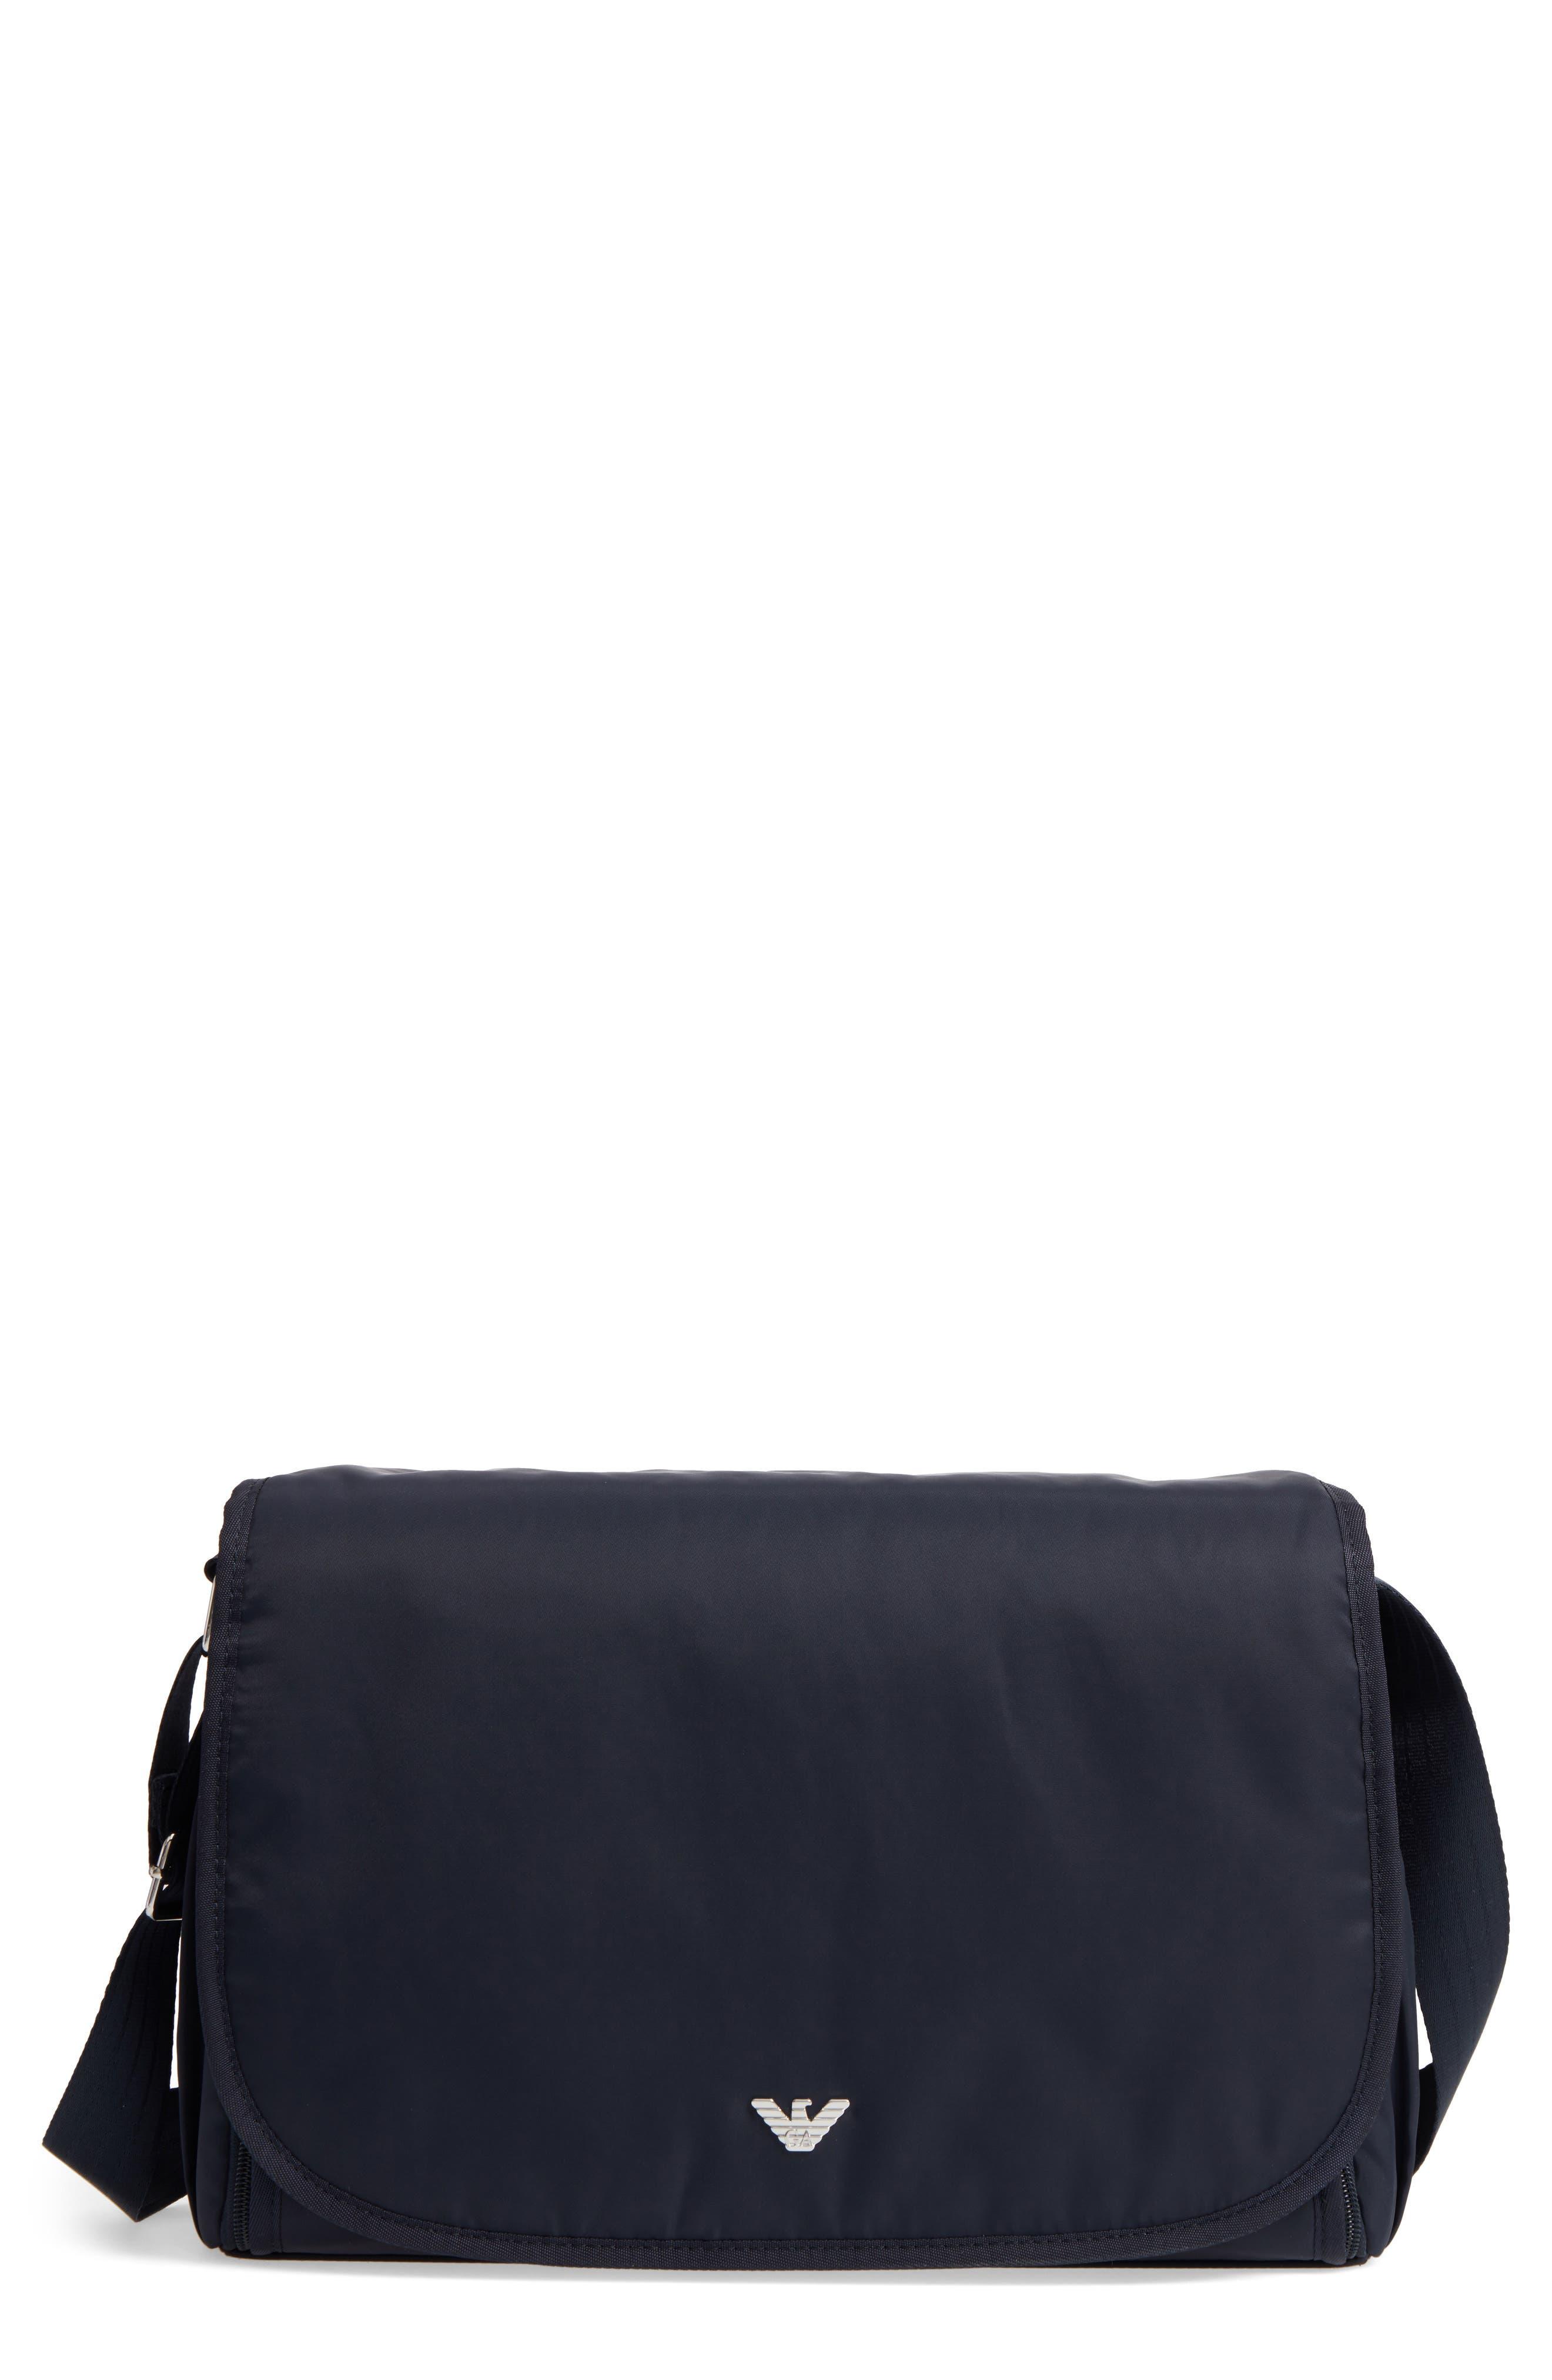 Alternate Image 1 Selected - Armani Junior Nylon Messenger Diaper Bag